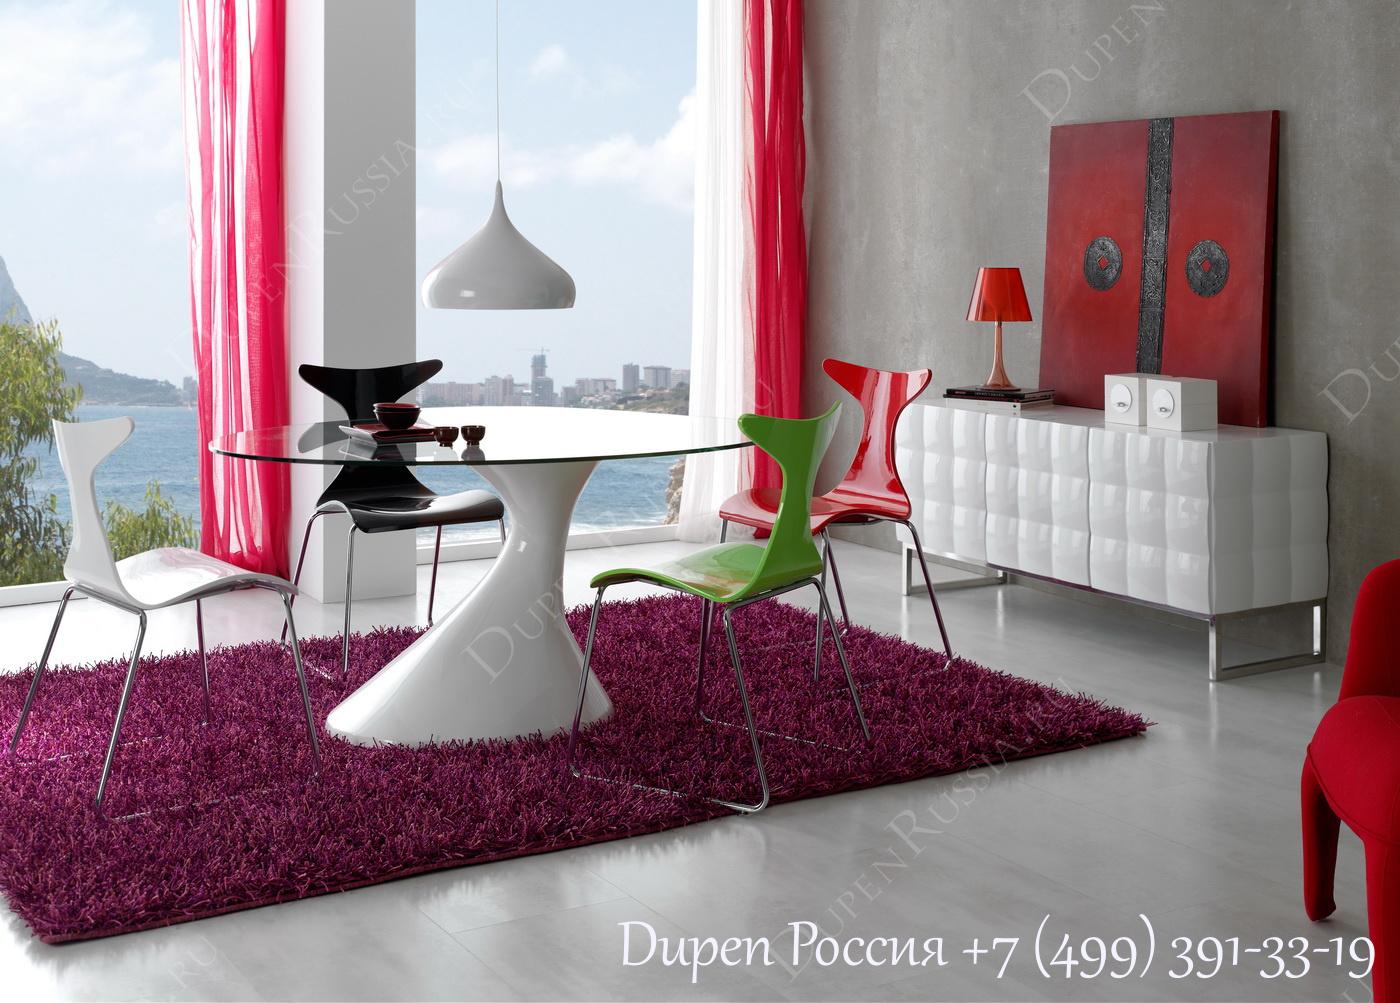 Буфет DUPEN W-750 Белый, Стол DUPEN DT-05, Стулья DUPEN CH-1002